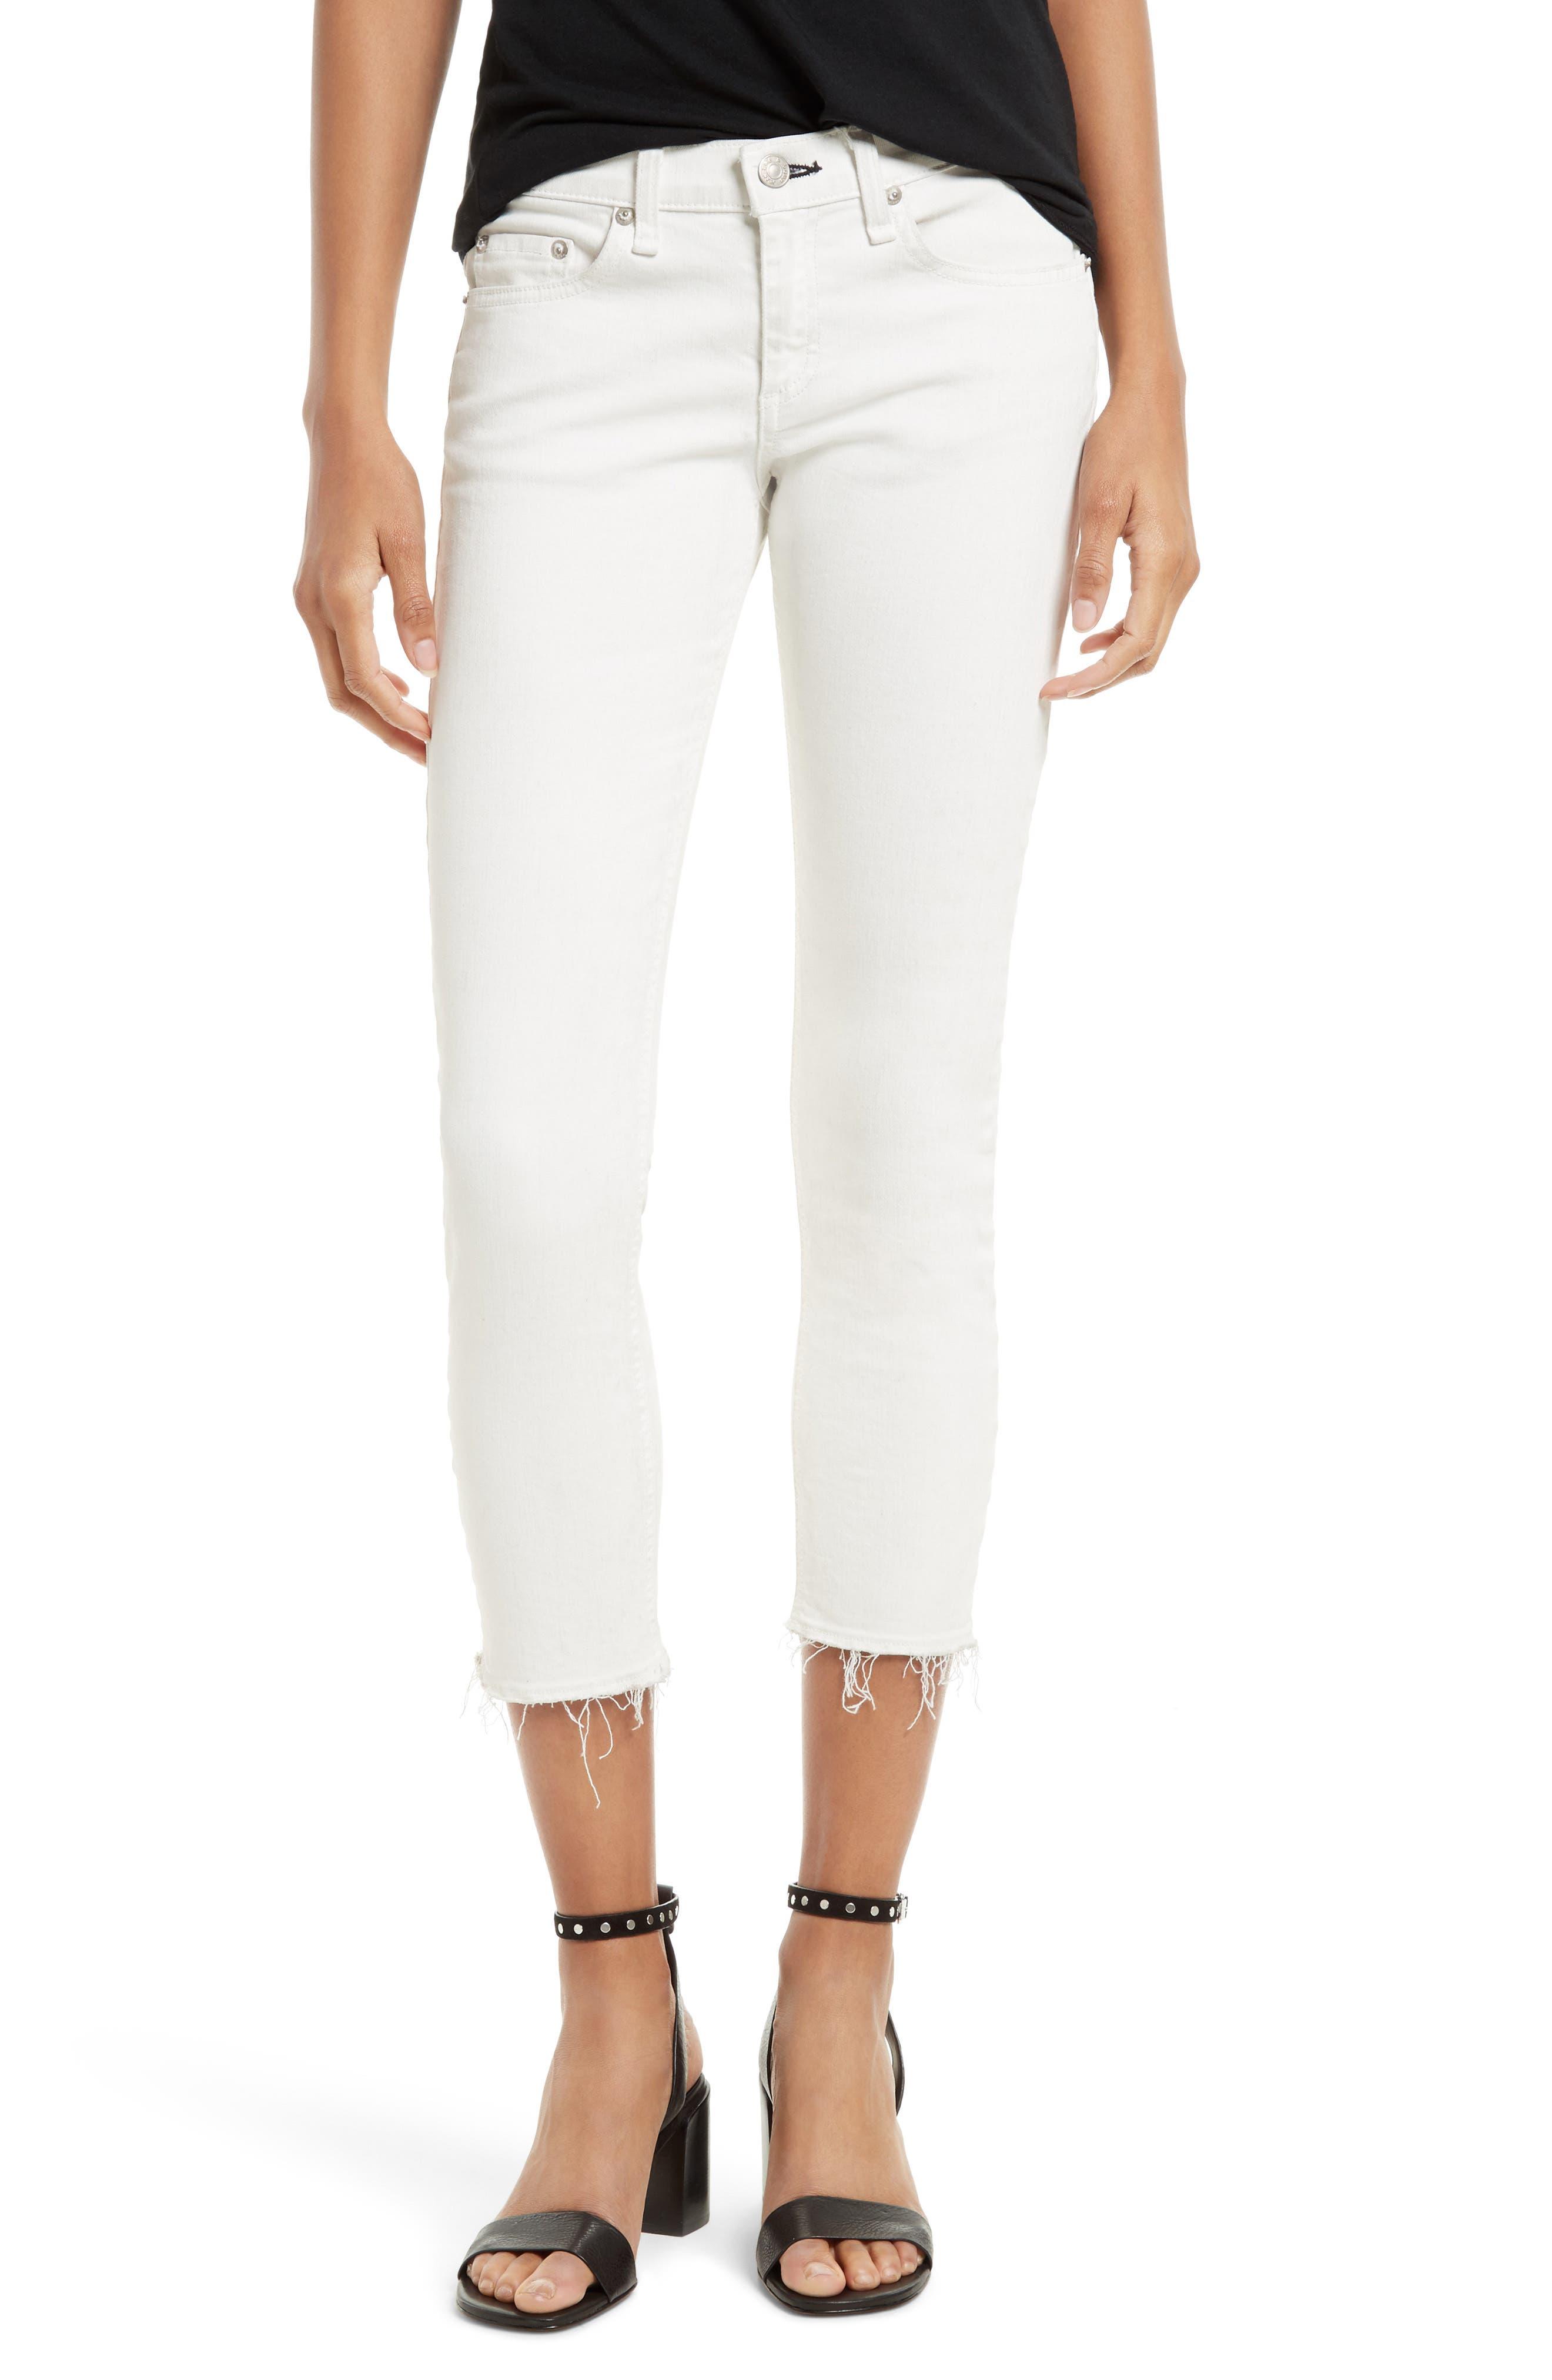 Main Image - rag & bone/JEAN Capri Skinny Jeans (Blanc with Fray)